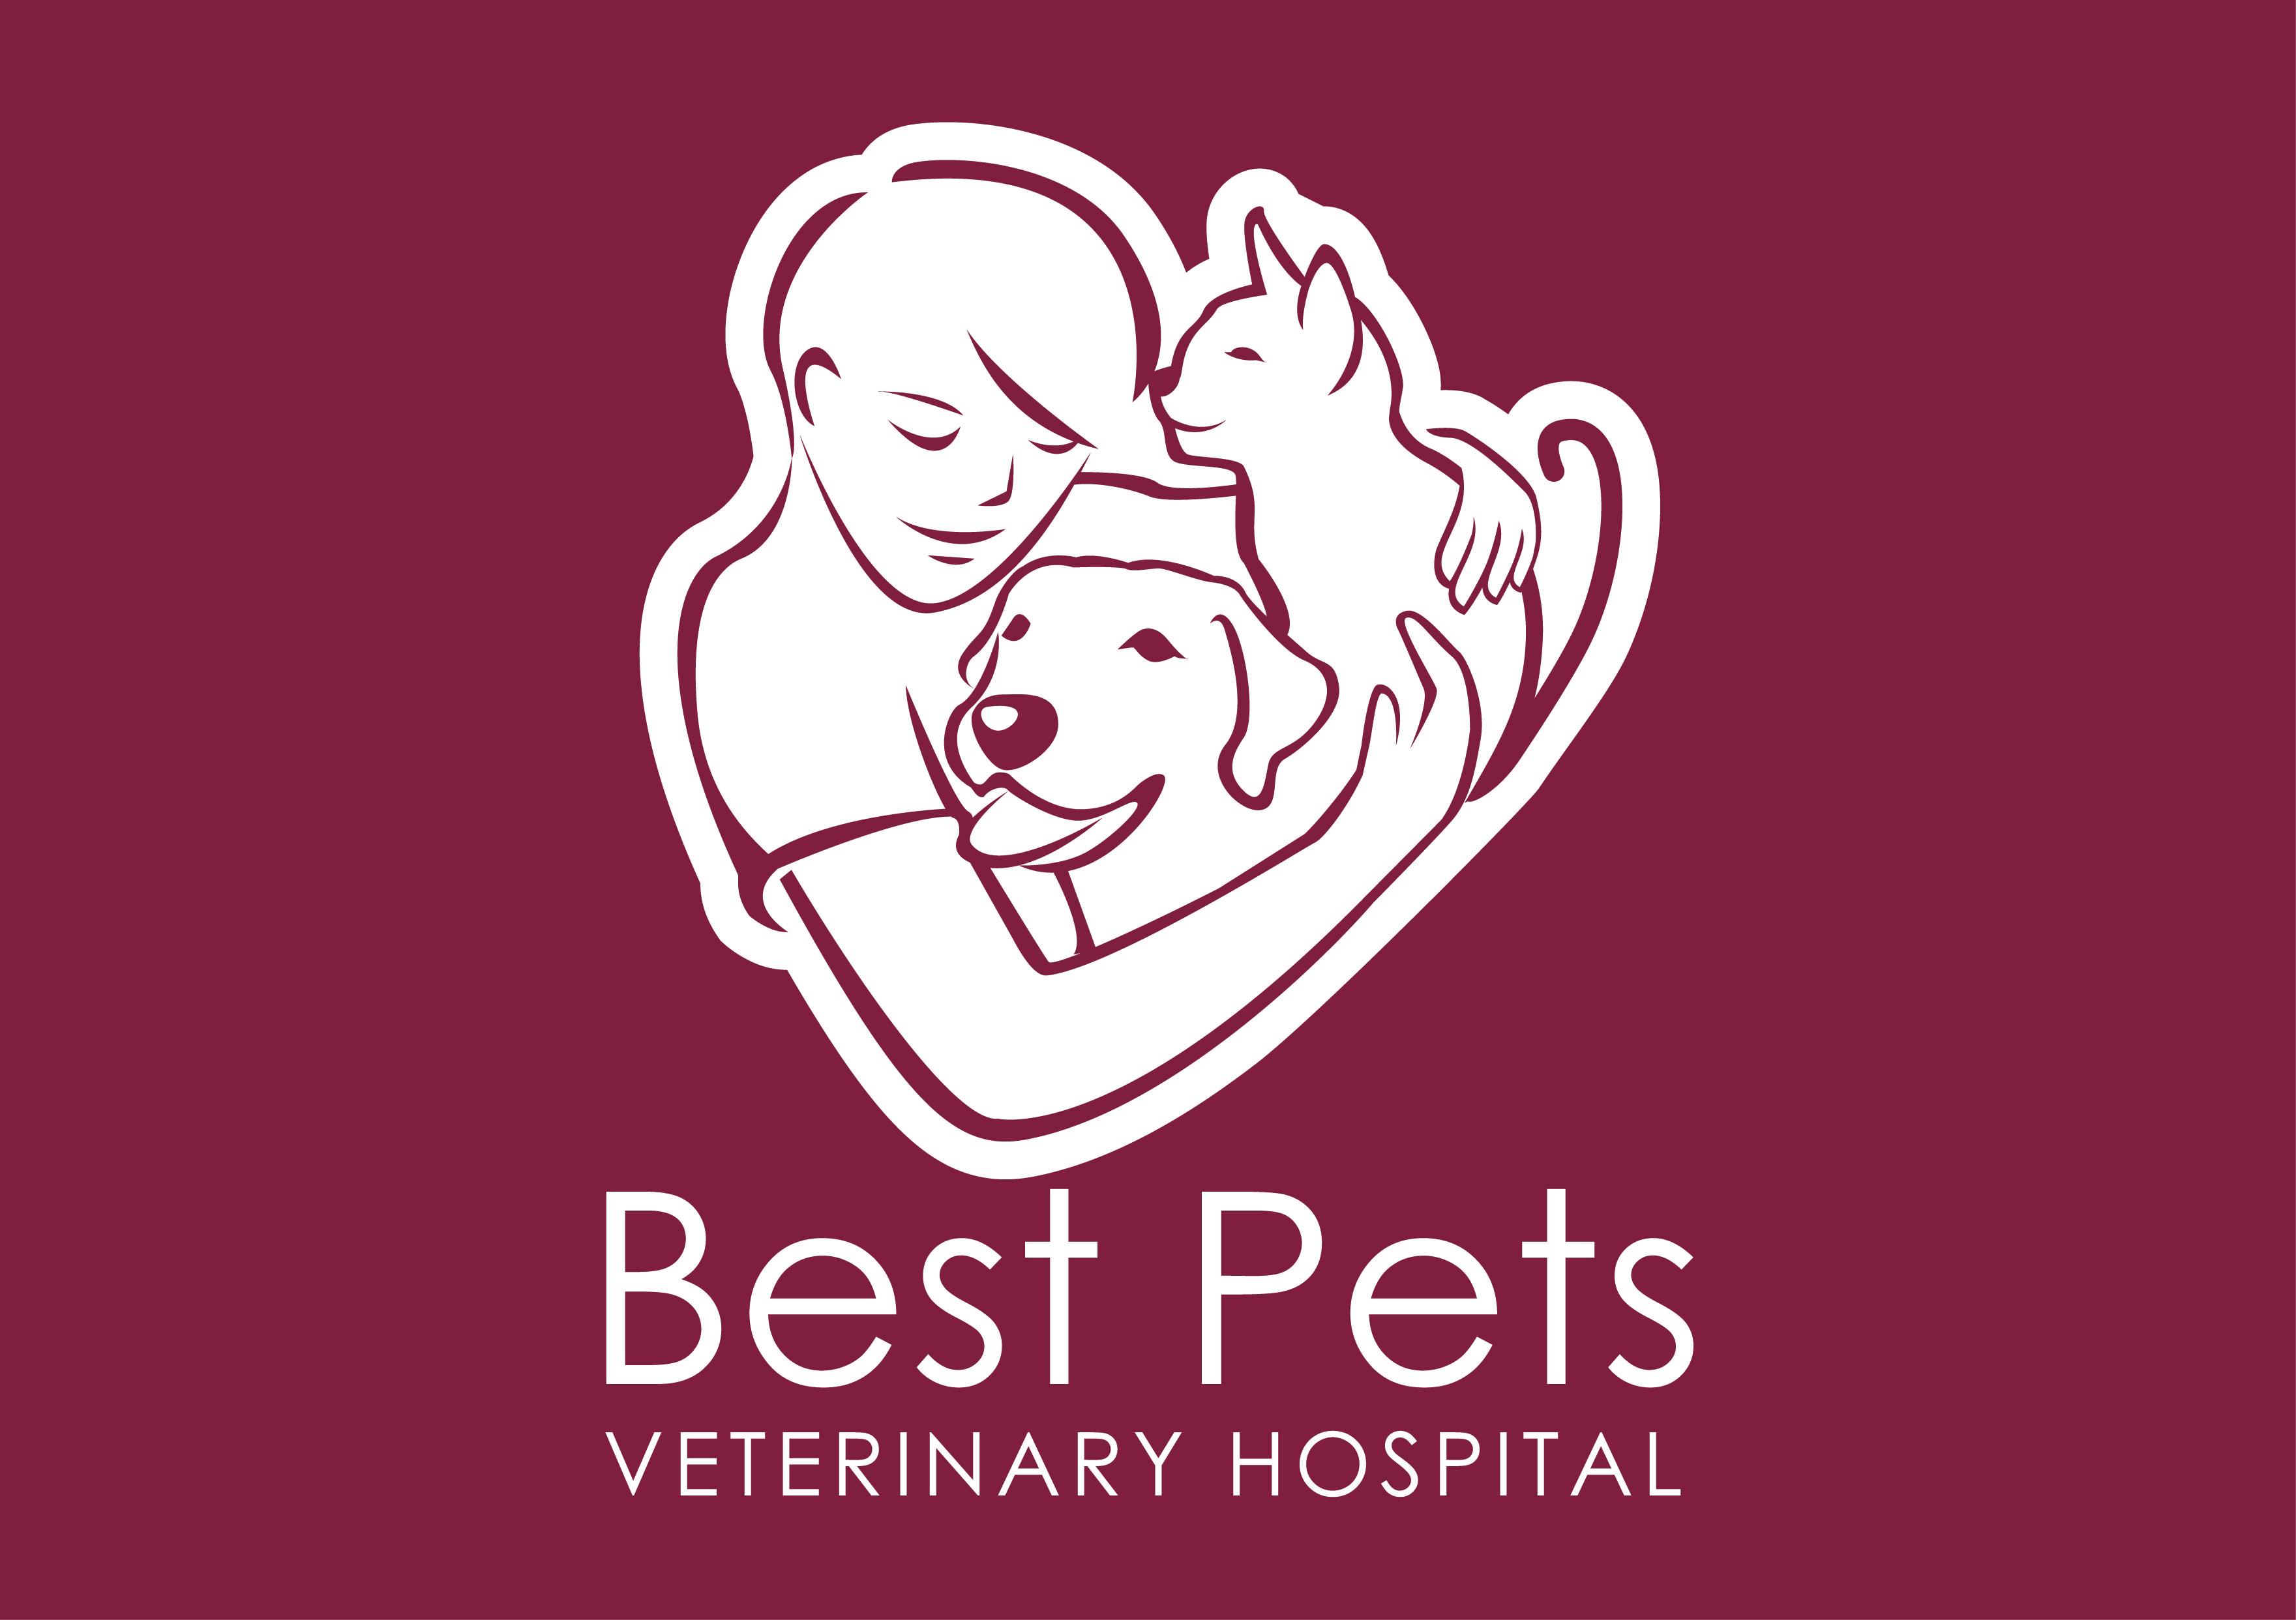 Best Pets Veterinary Hospital logo